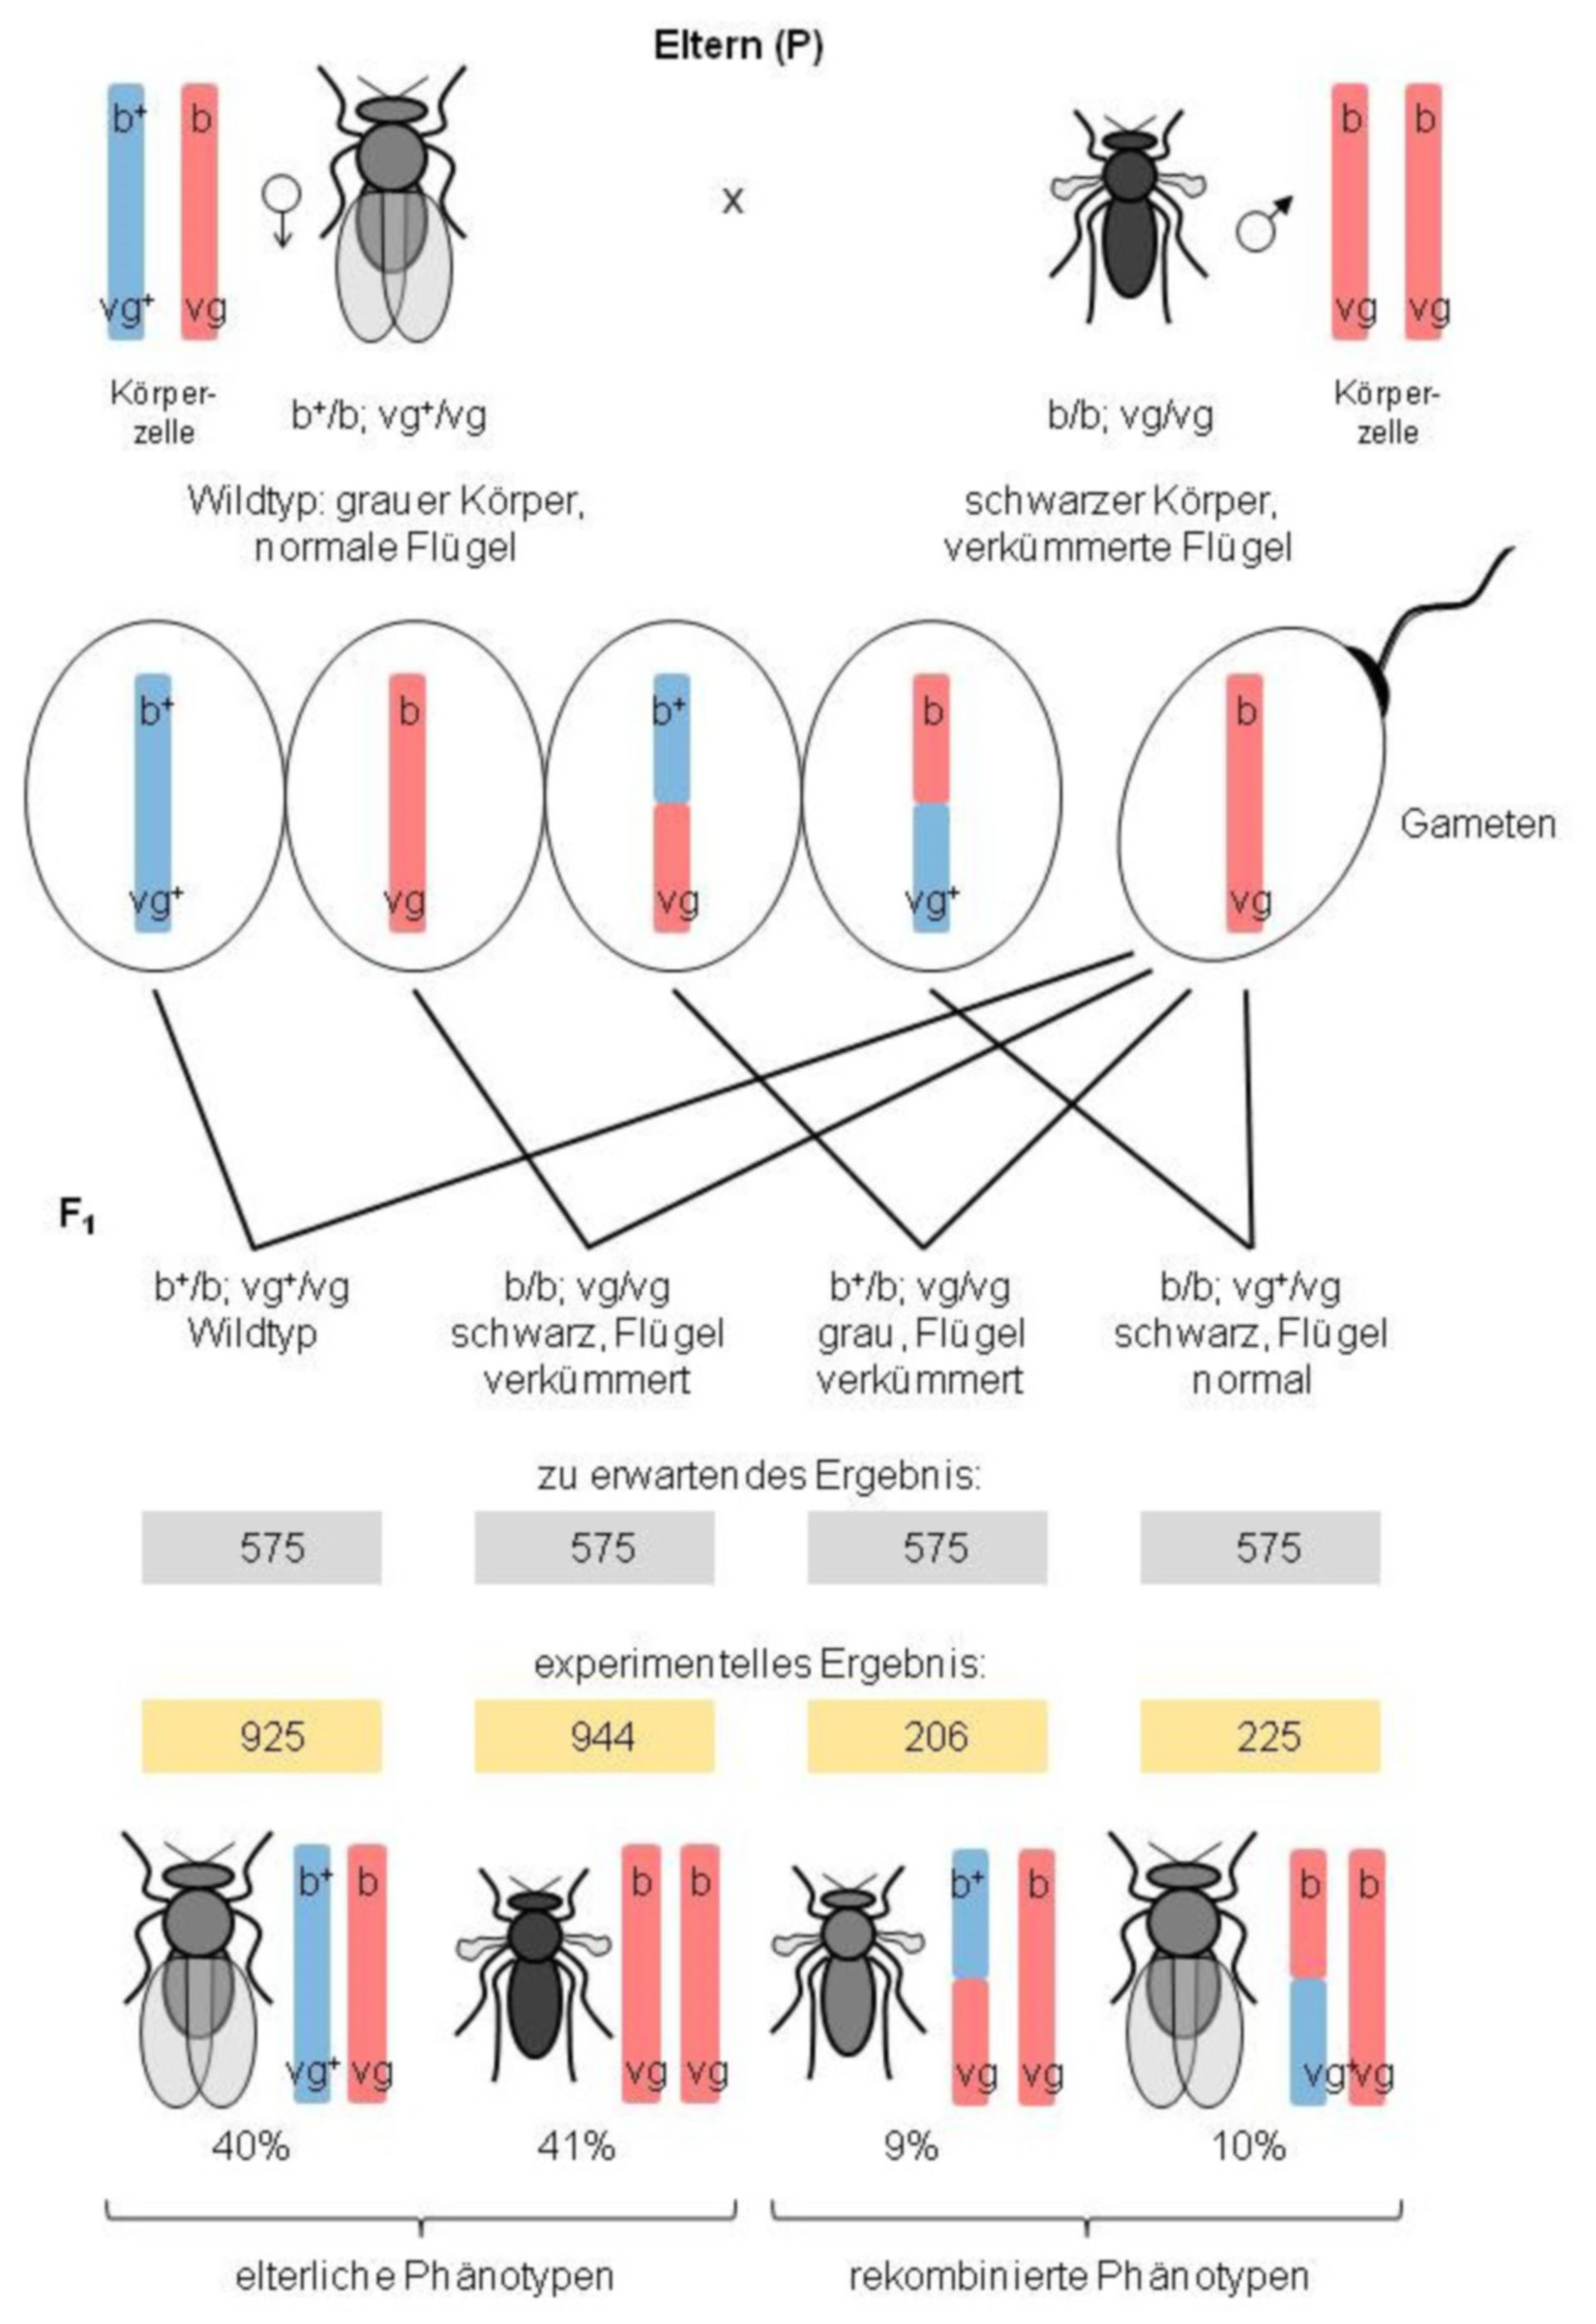 Crossbreeding with heterozygous Drosophila females and homozygous males